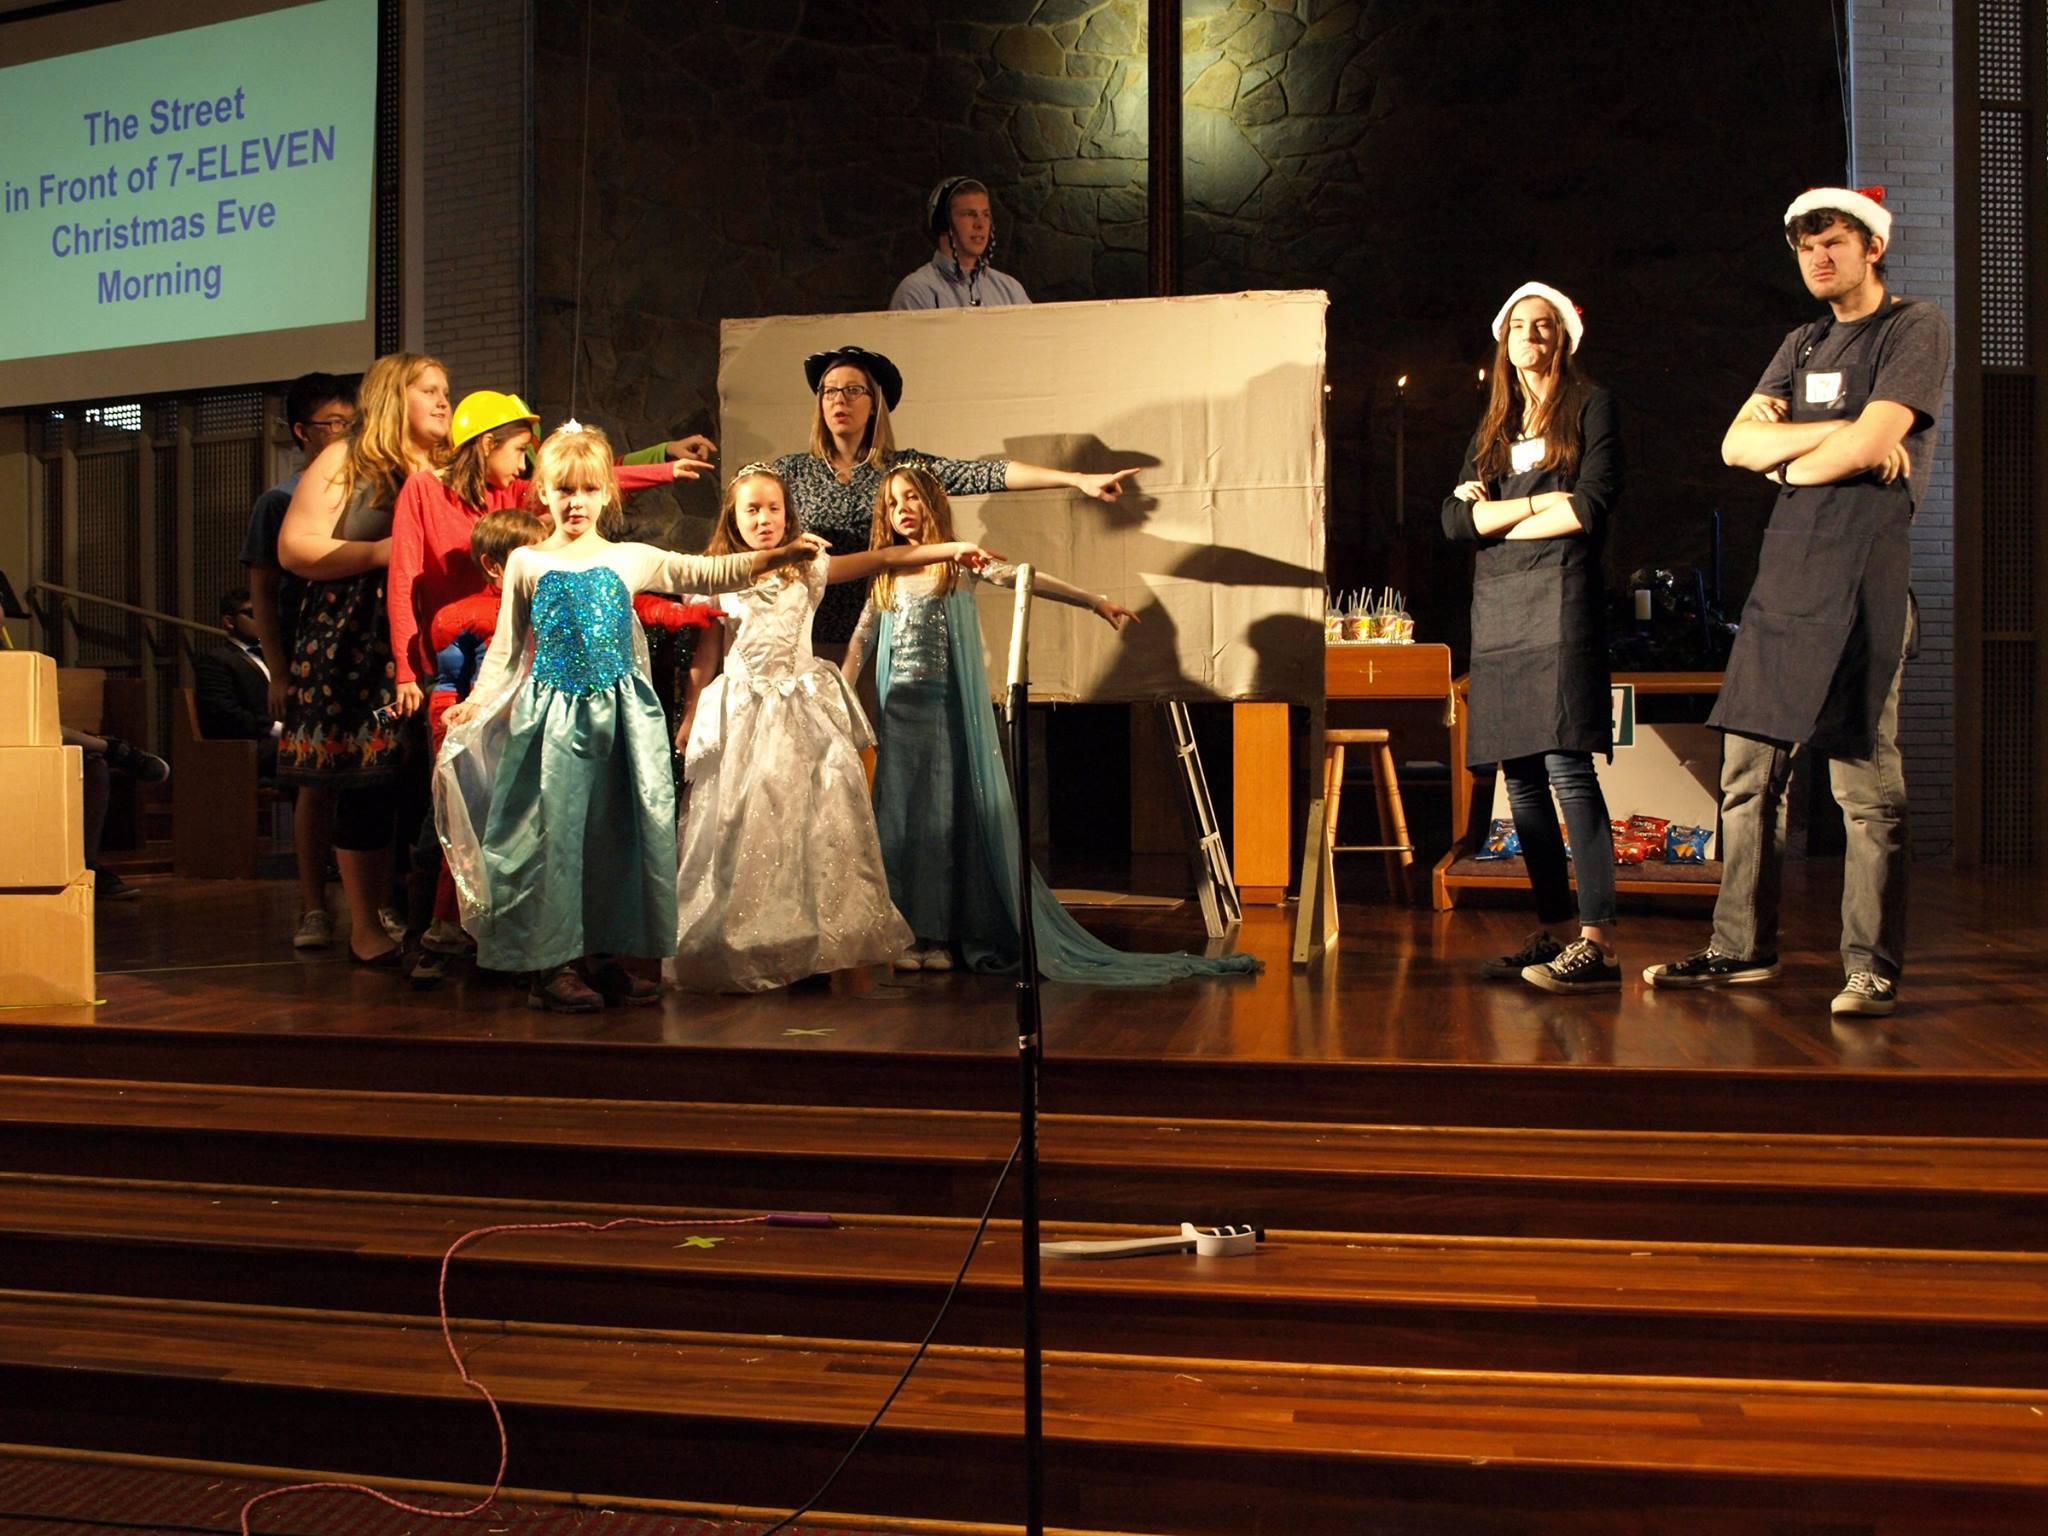 claremont-presbyterian-church-childrens-service-2.jpg